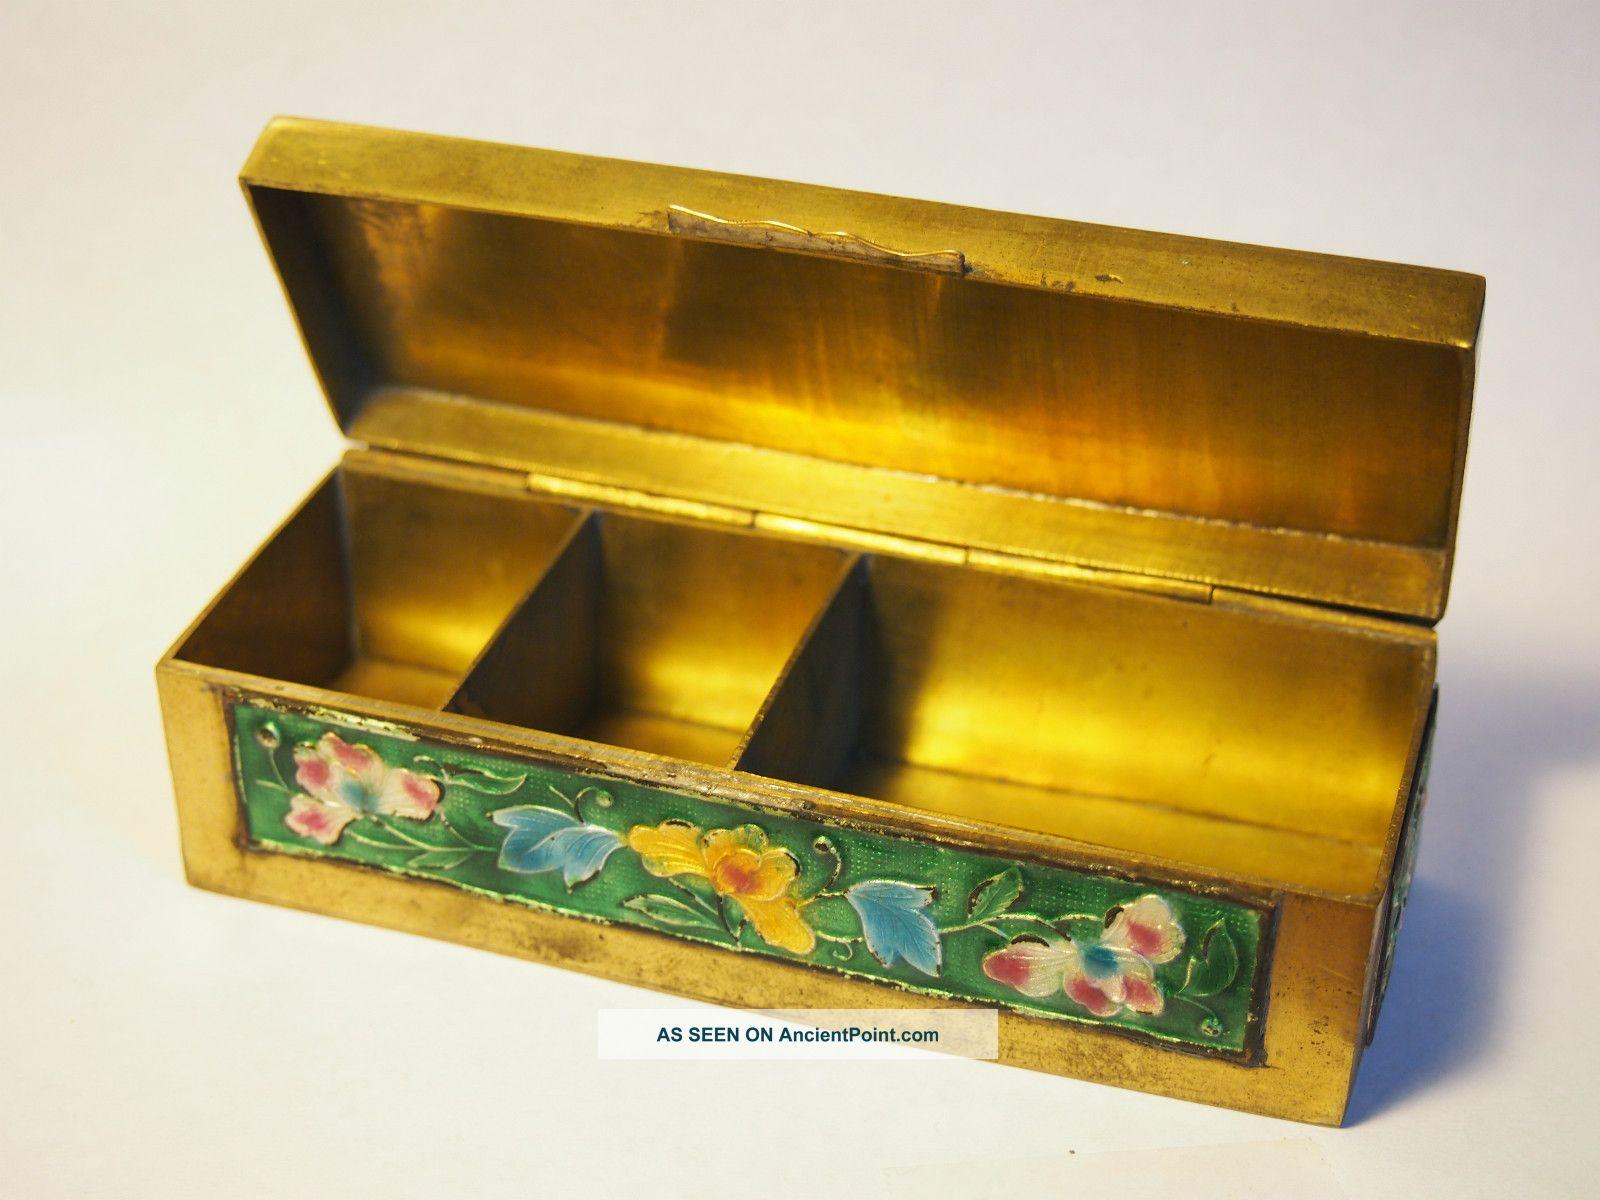 Antique Brass/enamel Chinese Stamp/trinket Box Boxes photo